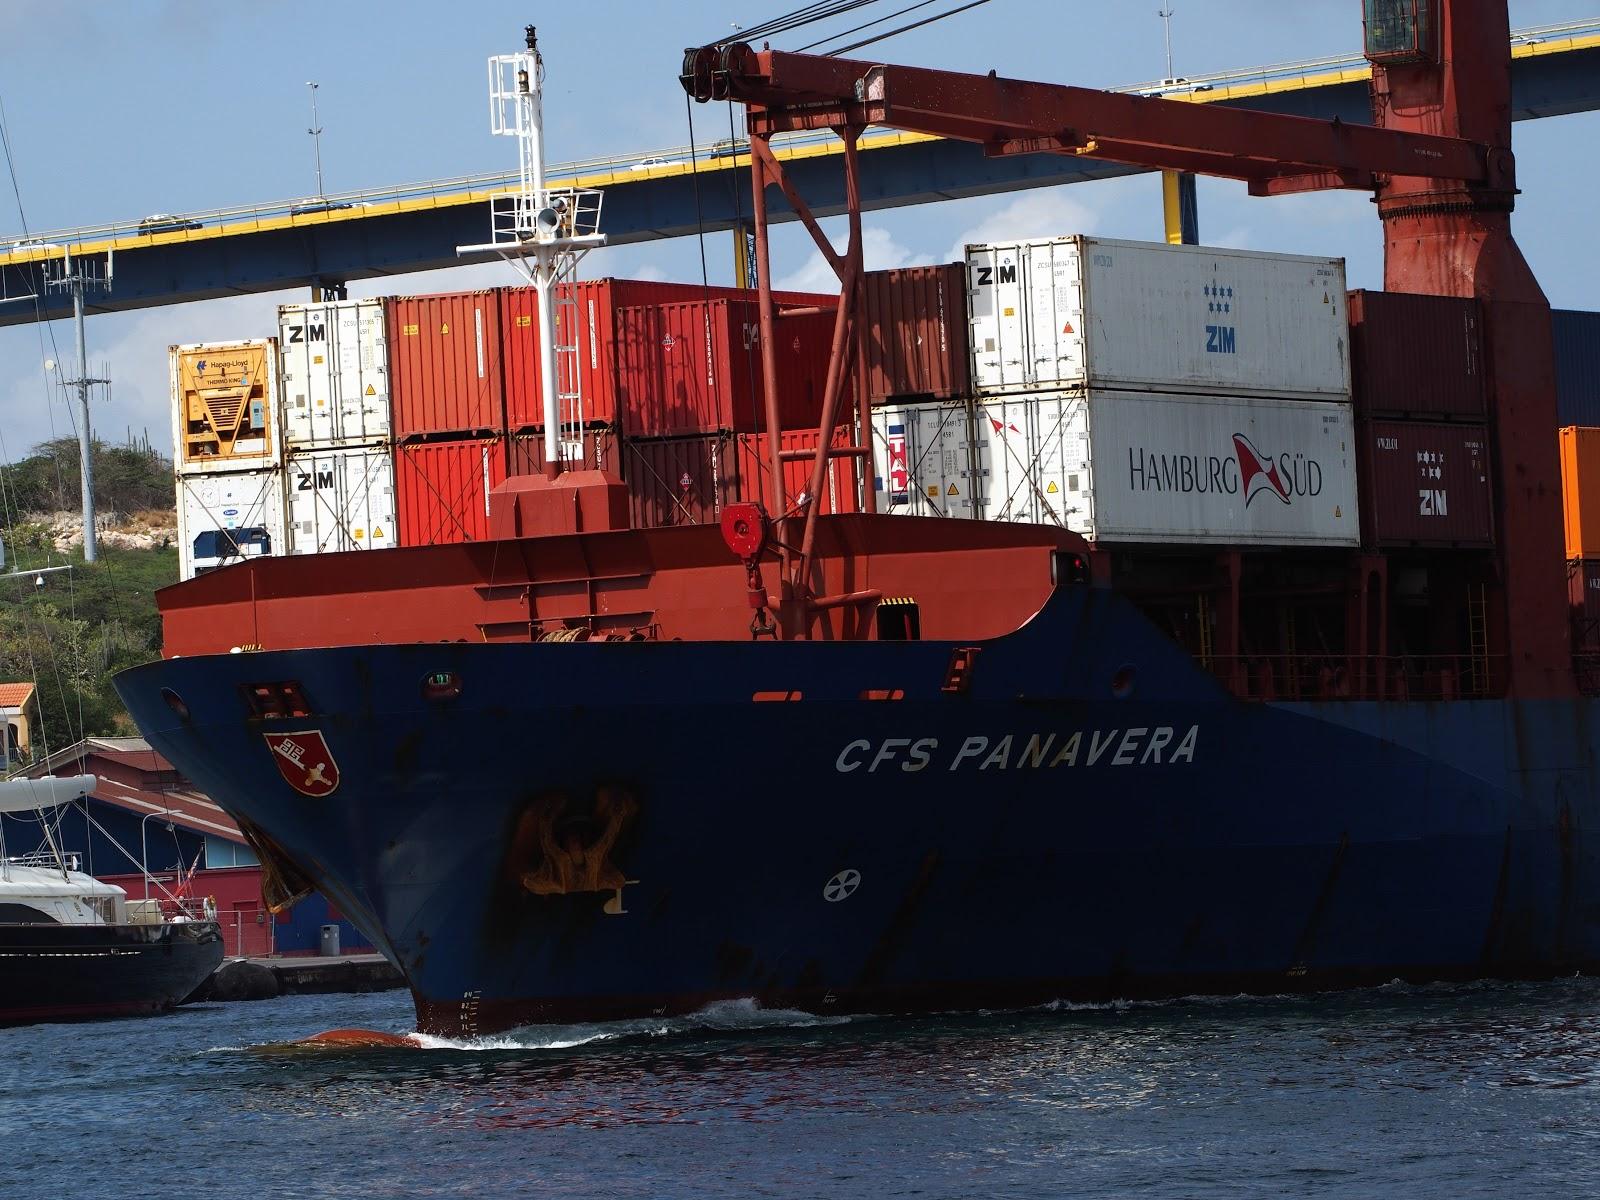 CFS Panavera, #cfspanavera #cargoship #cargo #shipping #caribbean 2014